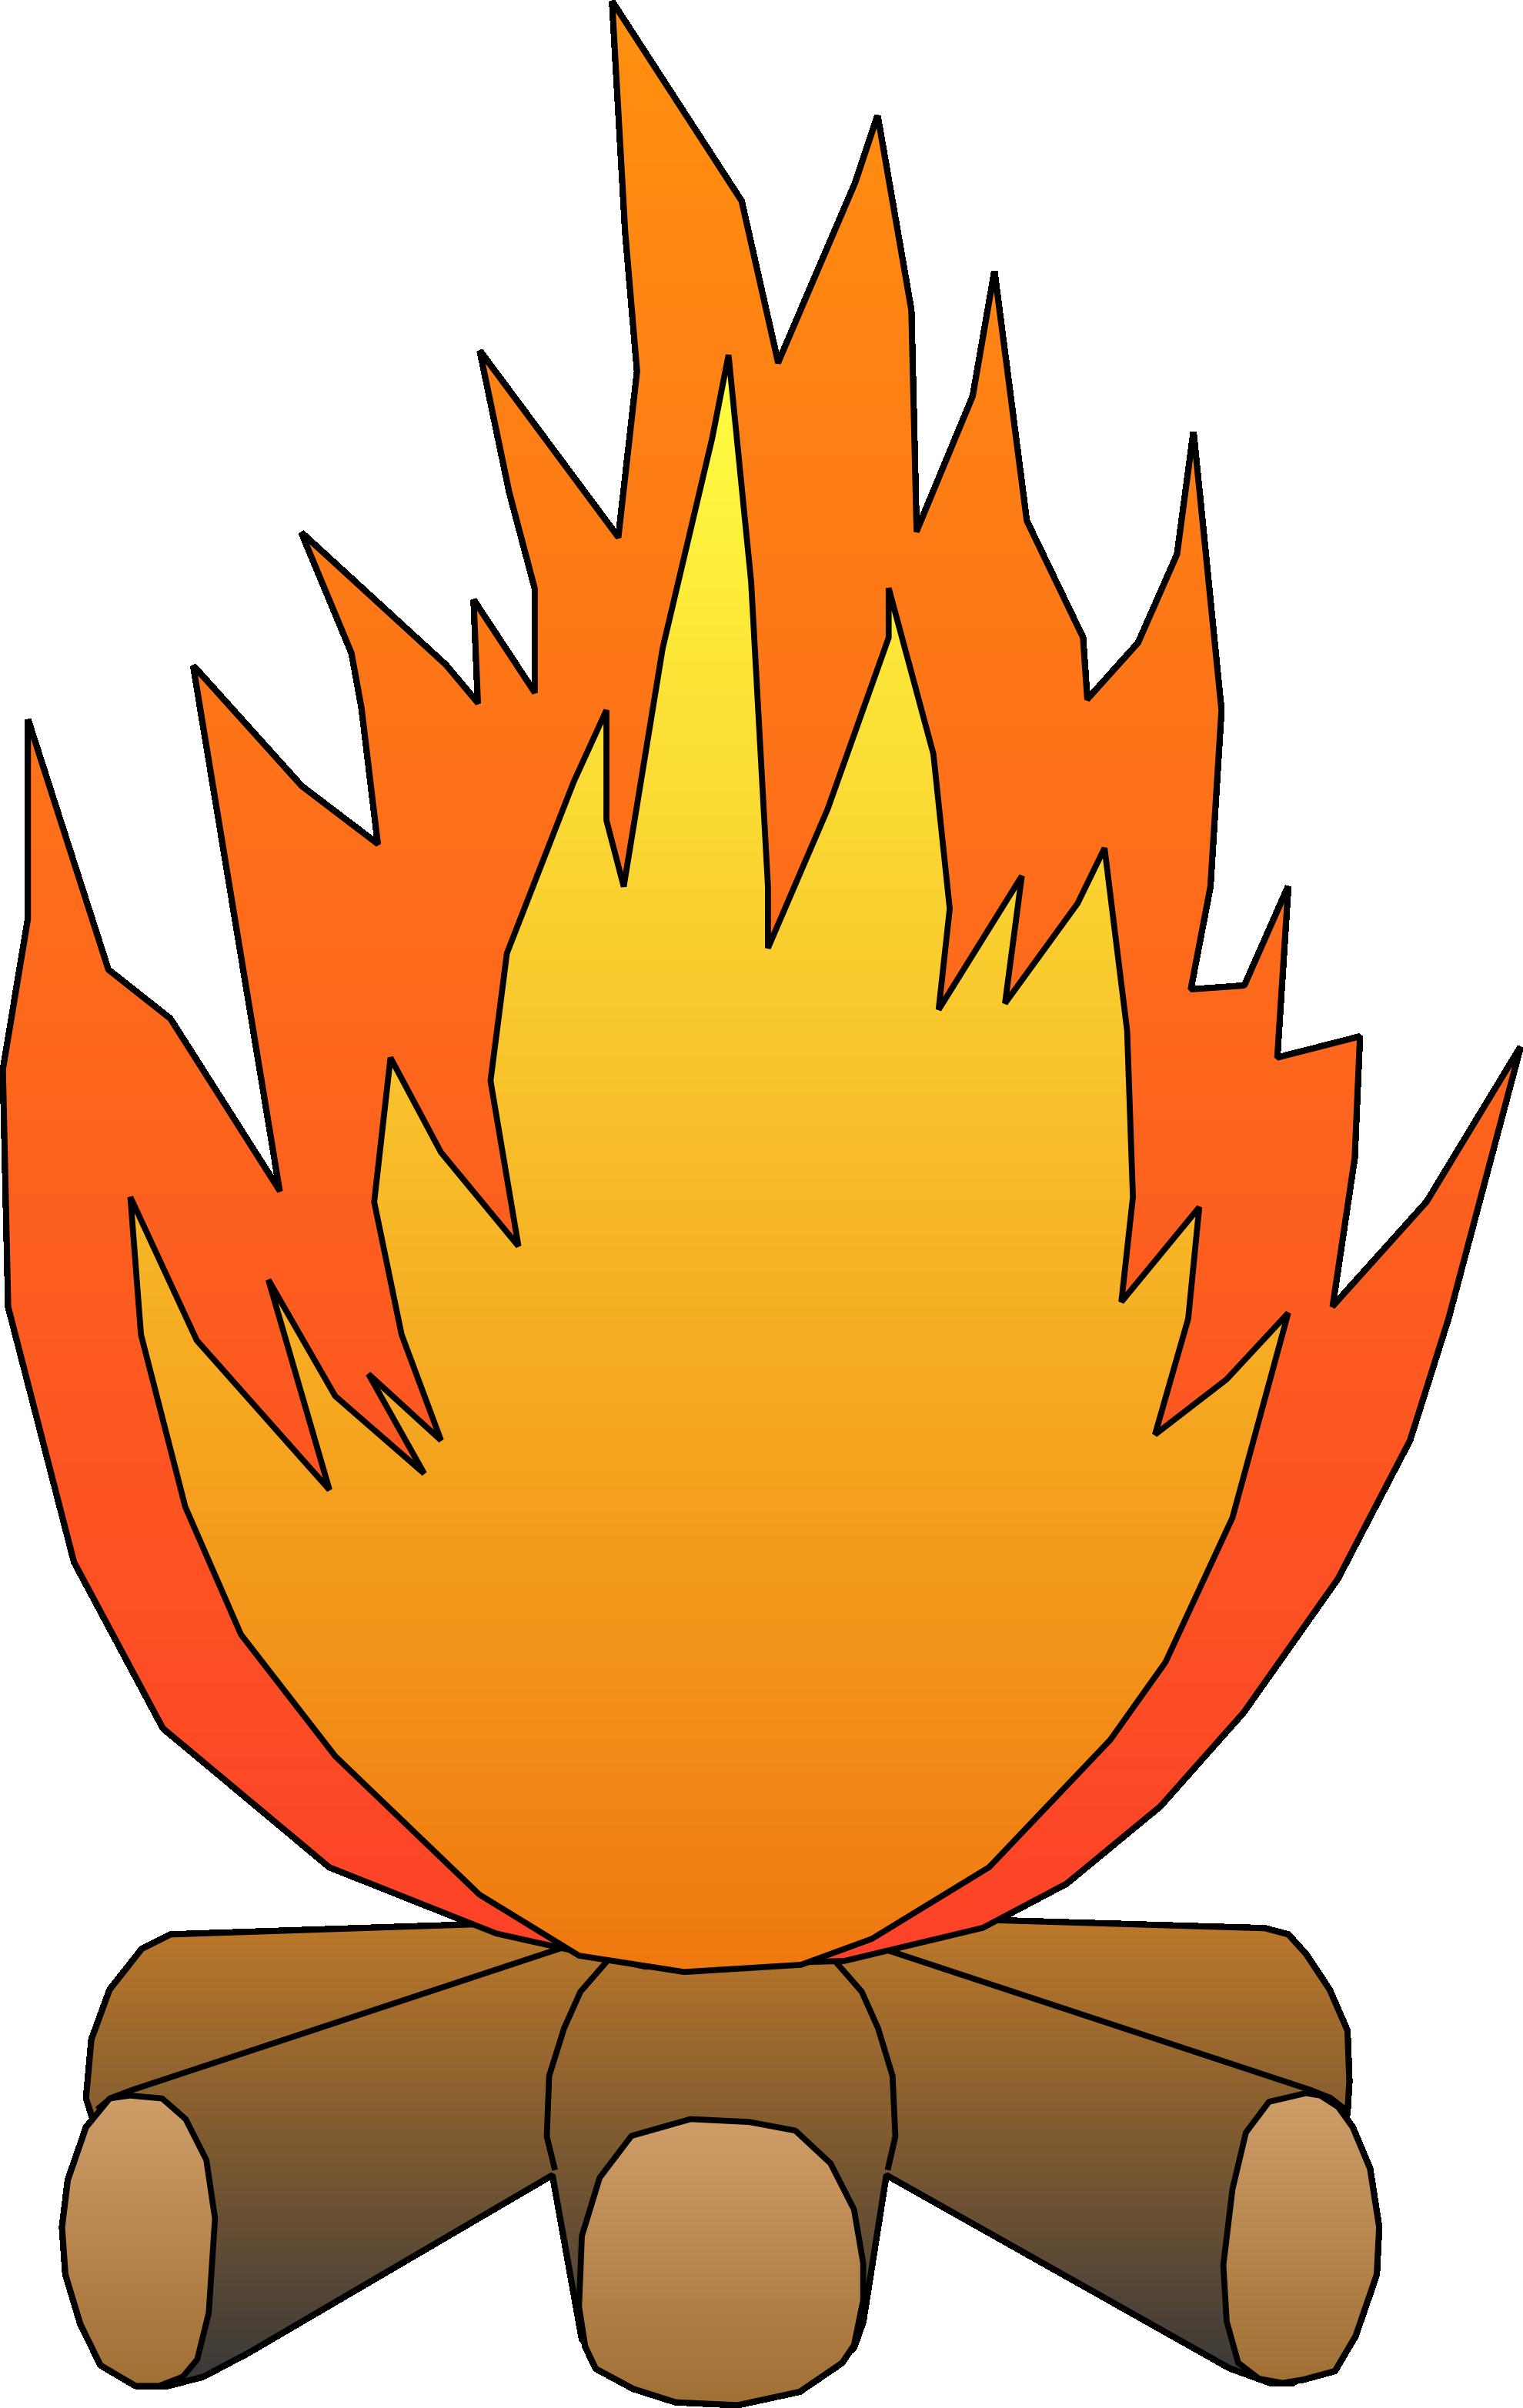 Campfire Marshmallow Clipart-campfire marshmallow clipart-7